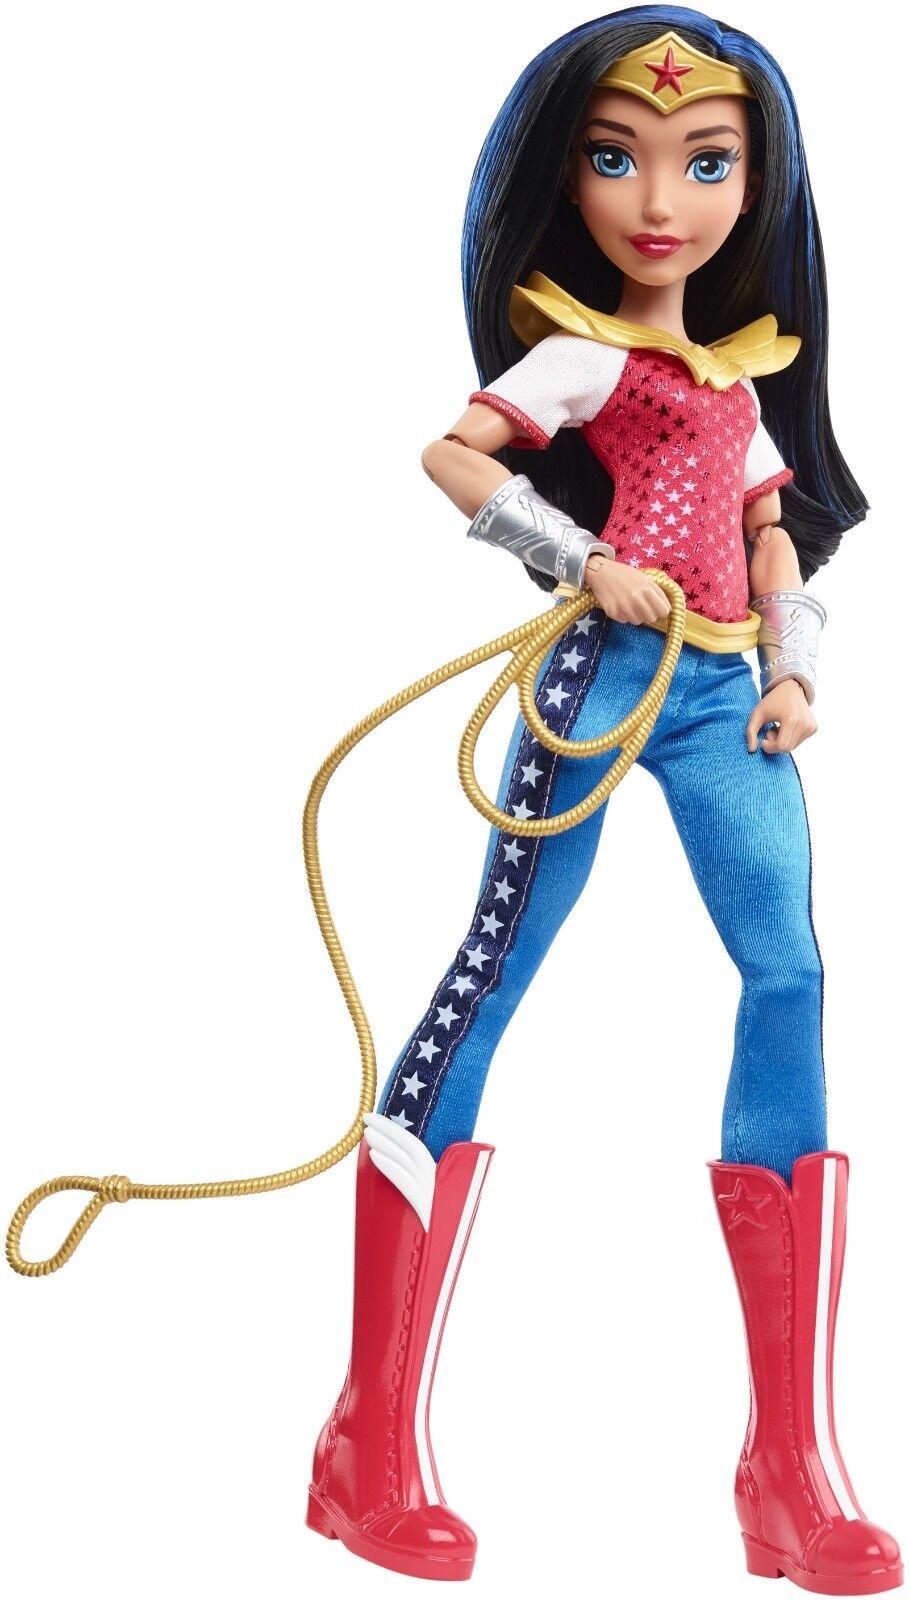 Mattel DC Super Hero Girls WONDER WOMAN 30 cm groß DLT62 NEU OVP